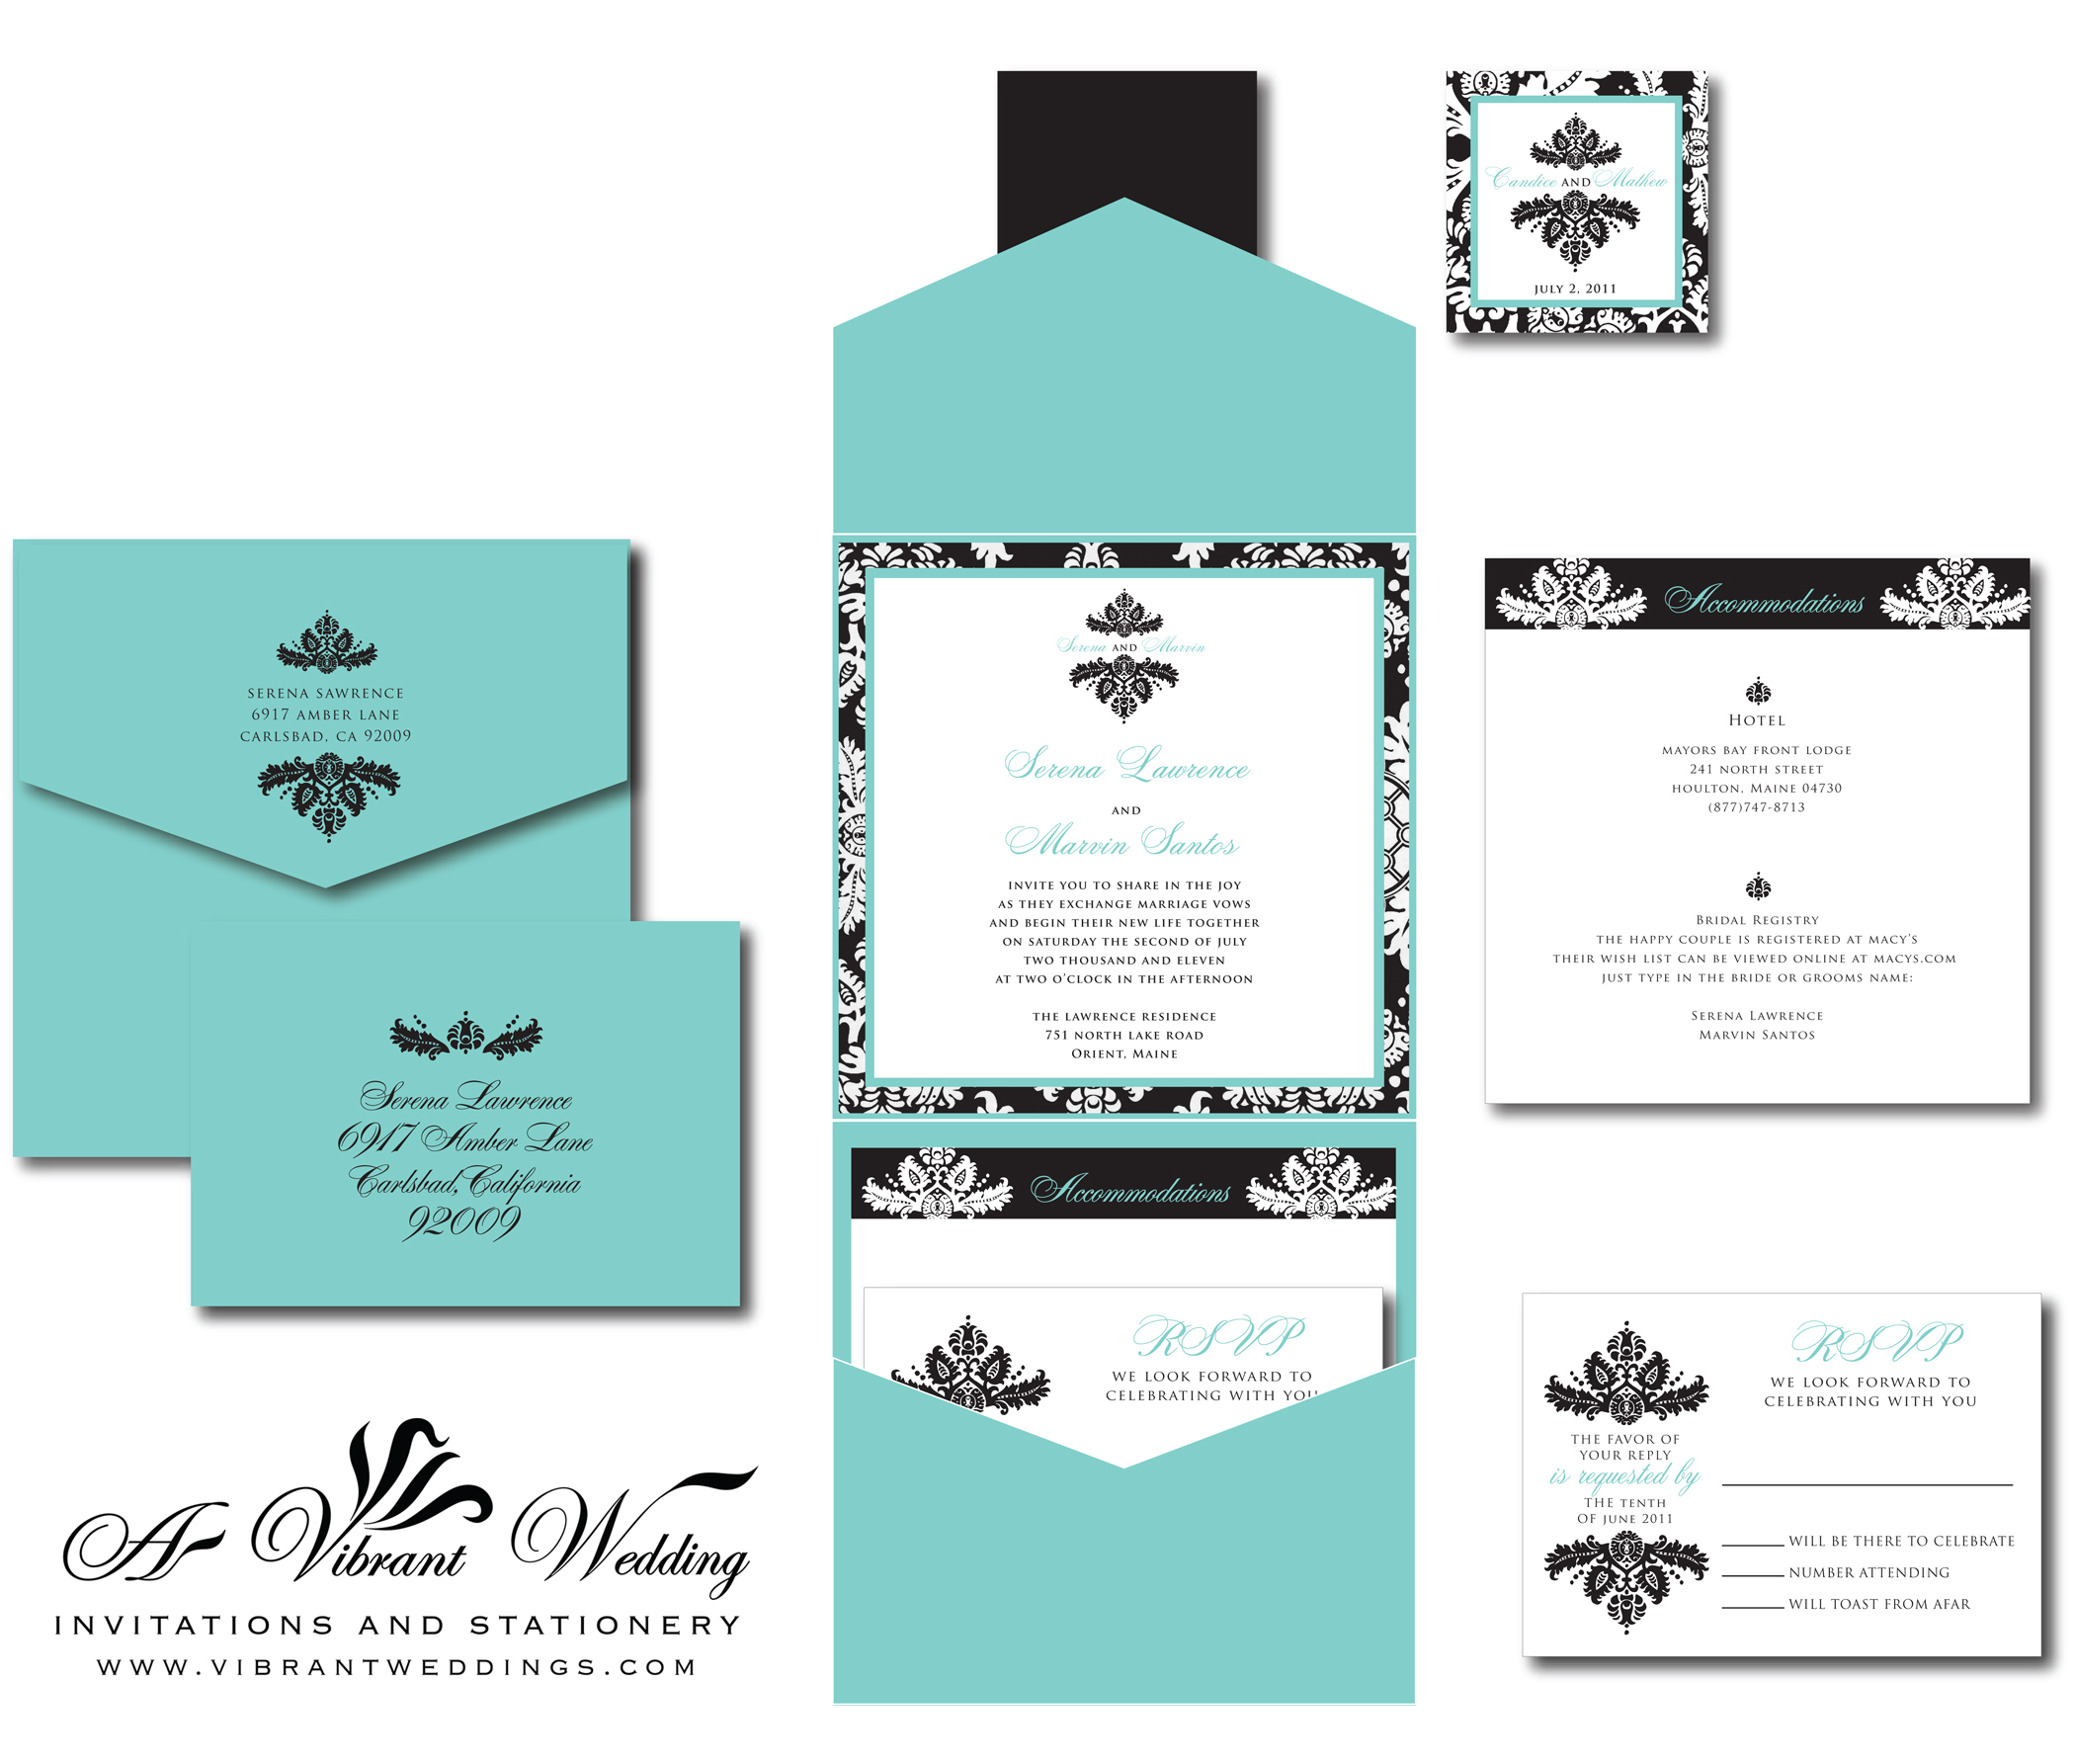 Black Damask Wedding Invitation – A Vibrant Wedding